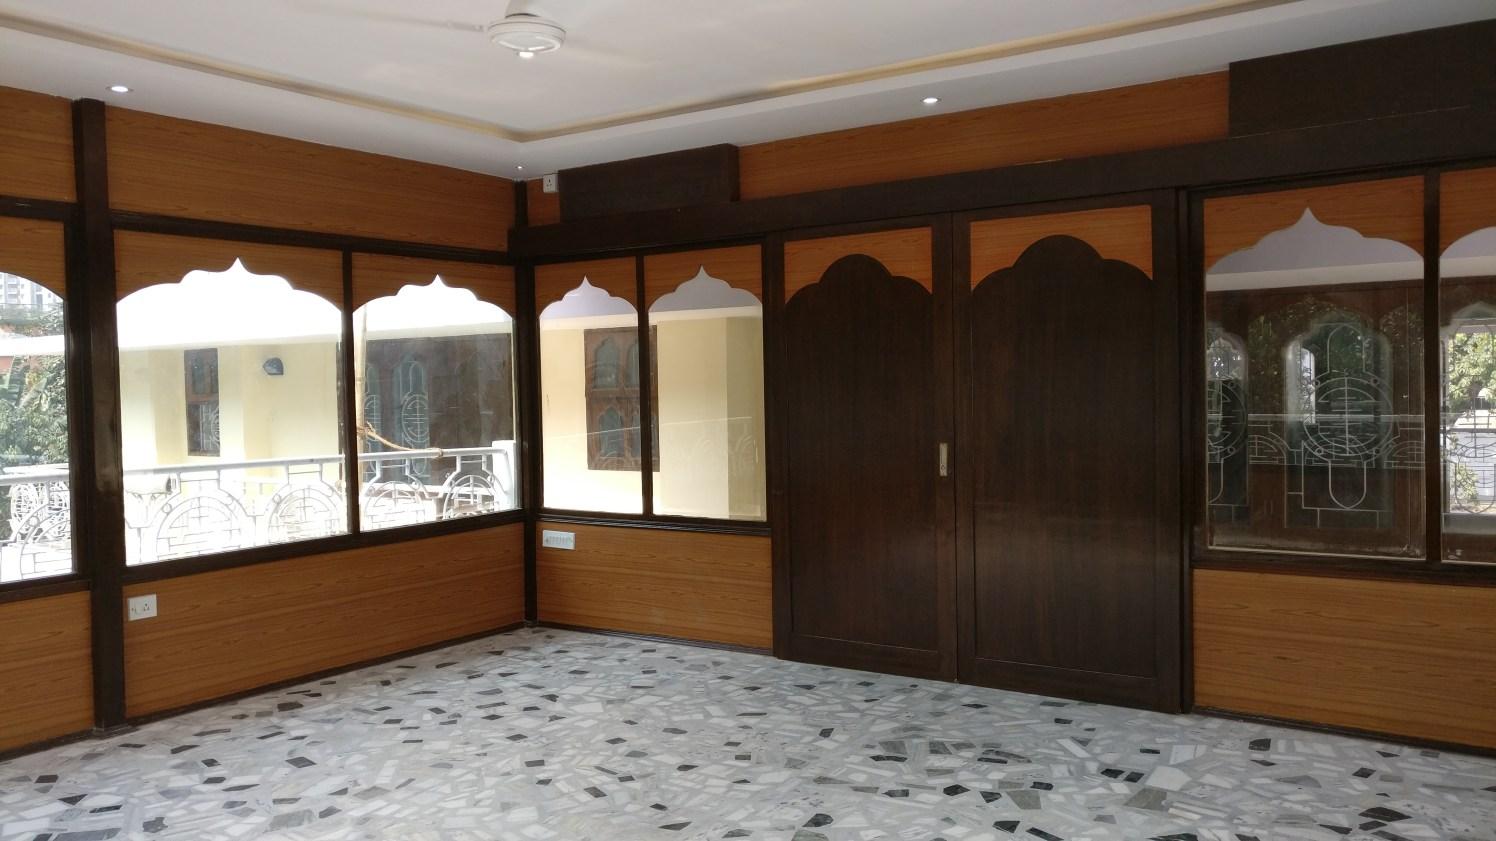 Veranda With wooden Window Frames by Chandan Kataruka Open-spaces Contemporary   Interior Design Photos & Ideas